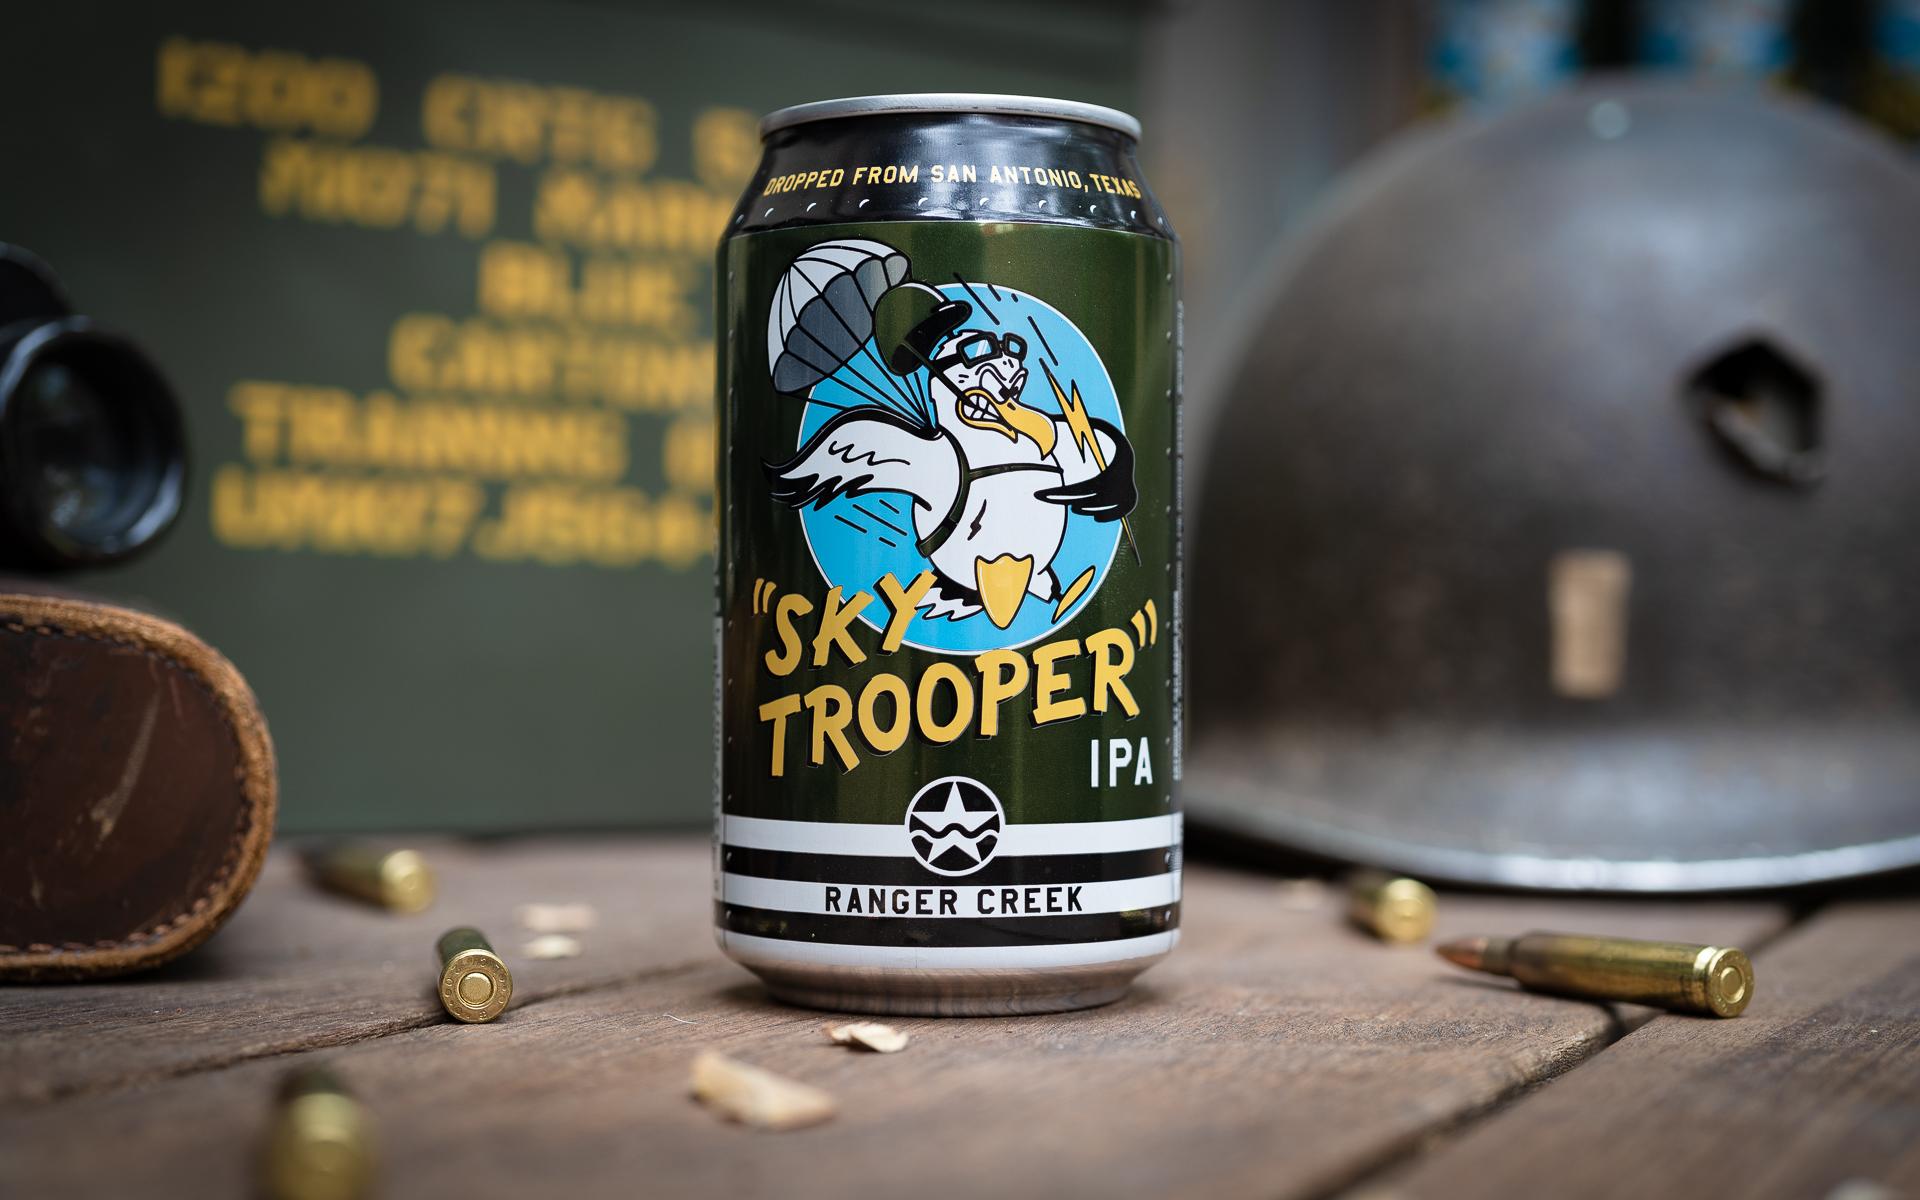 Ranger Creek Skytrooper IPA